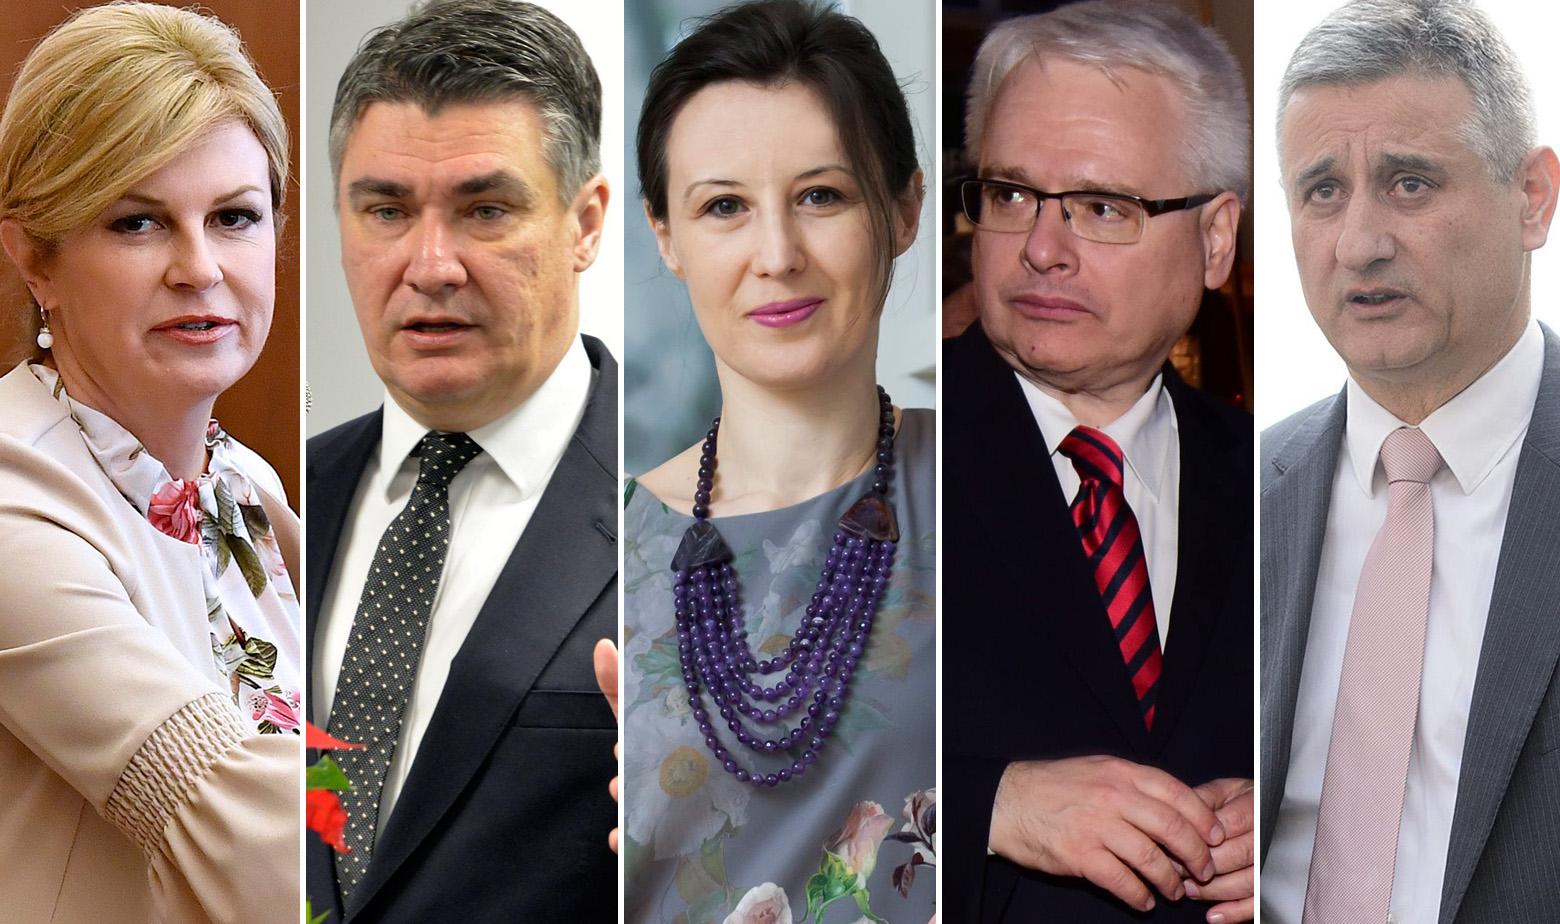 Kolinda Grabar Kitarović, Zoran Milanović, Dalija Orešković, Ivo Josipović, Tomislav Karamarko